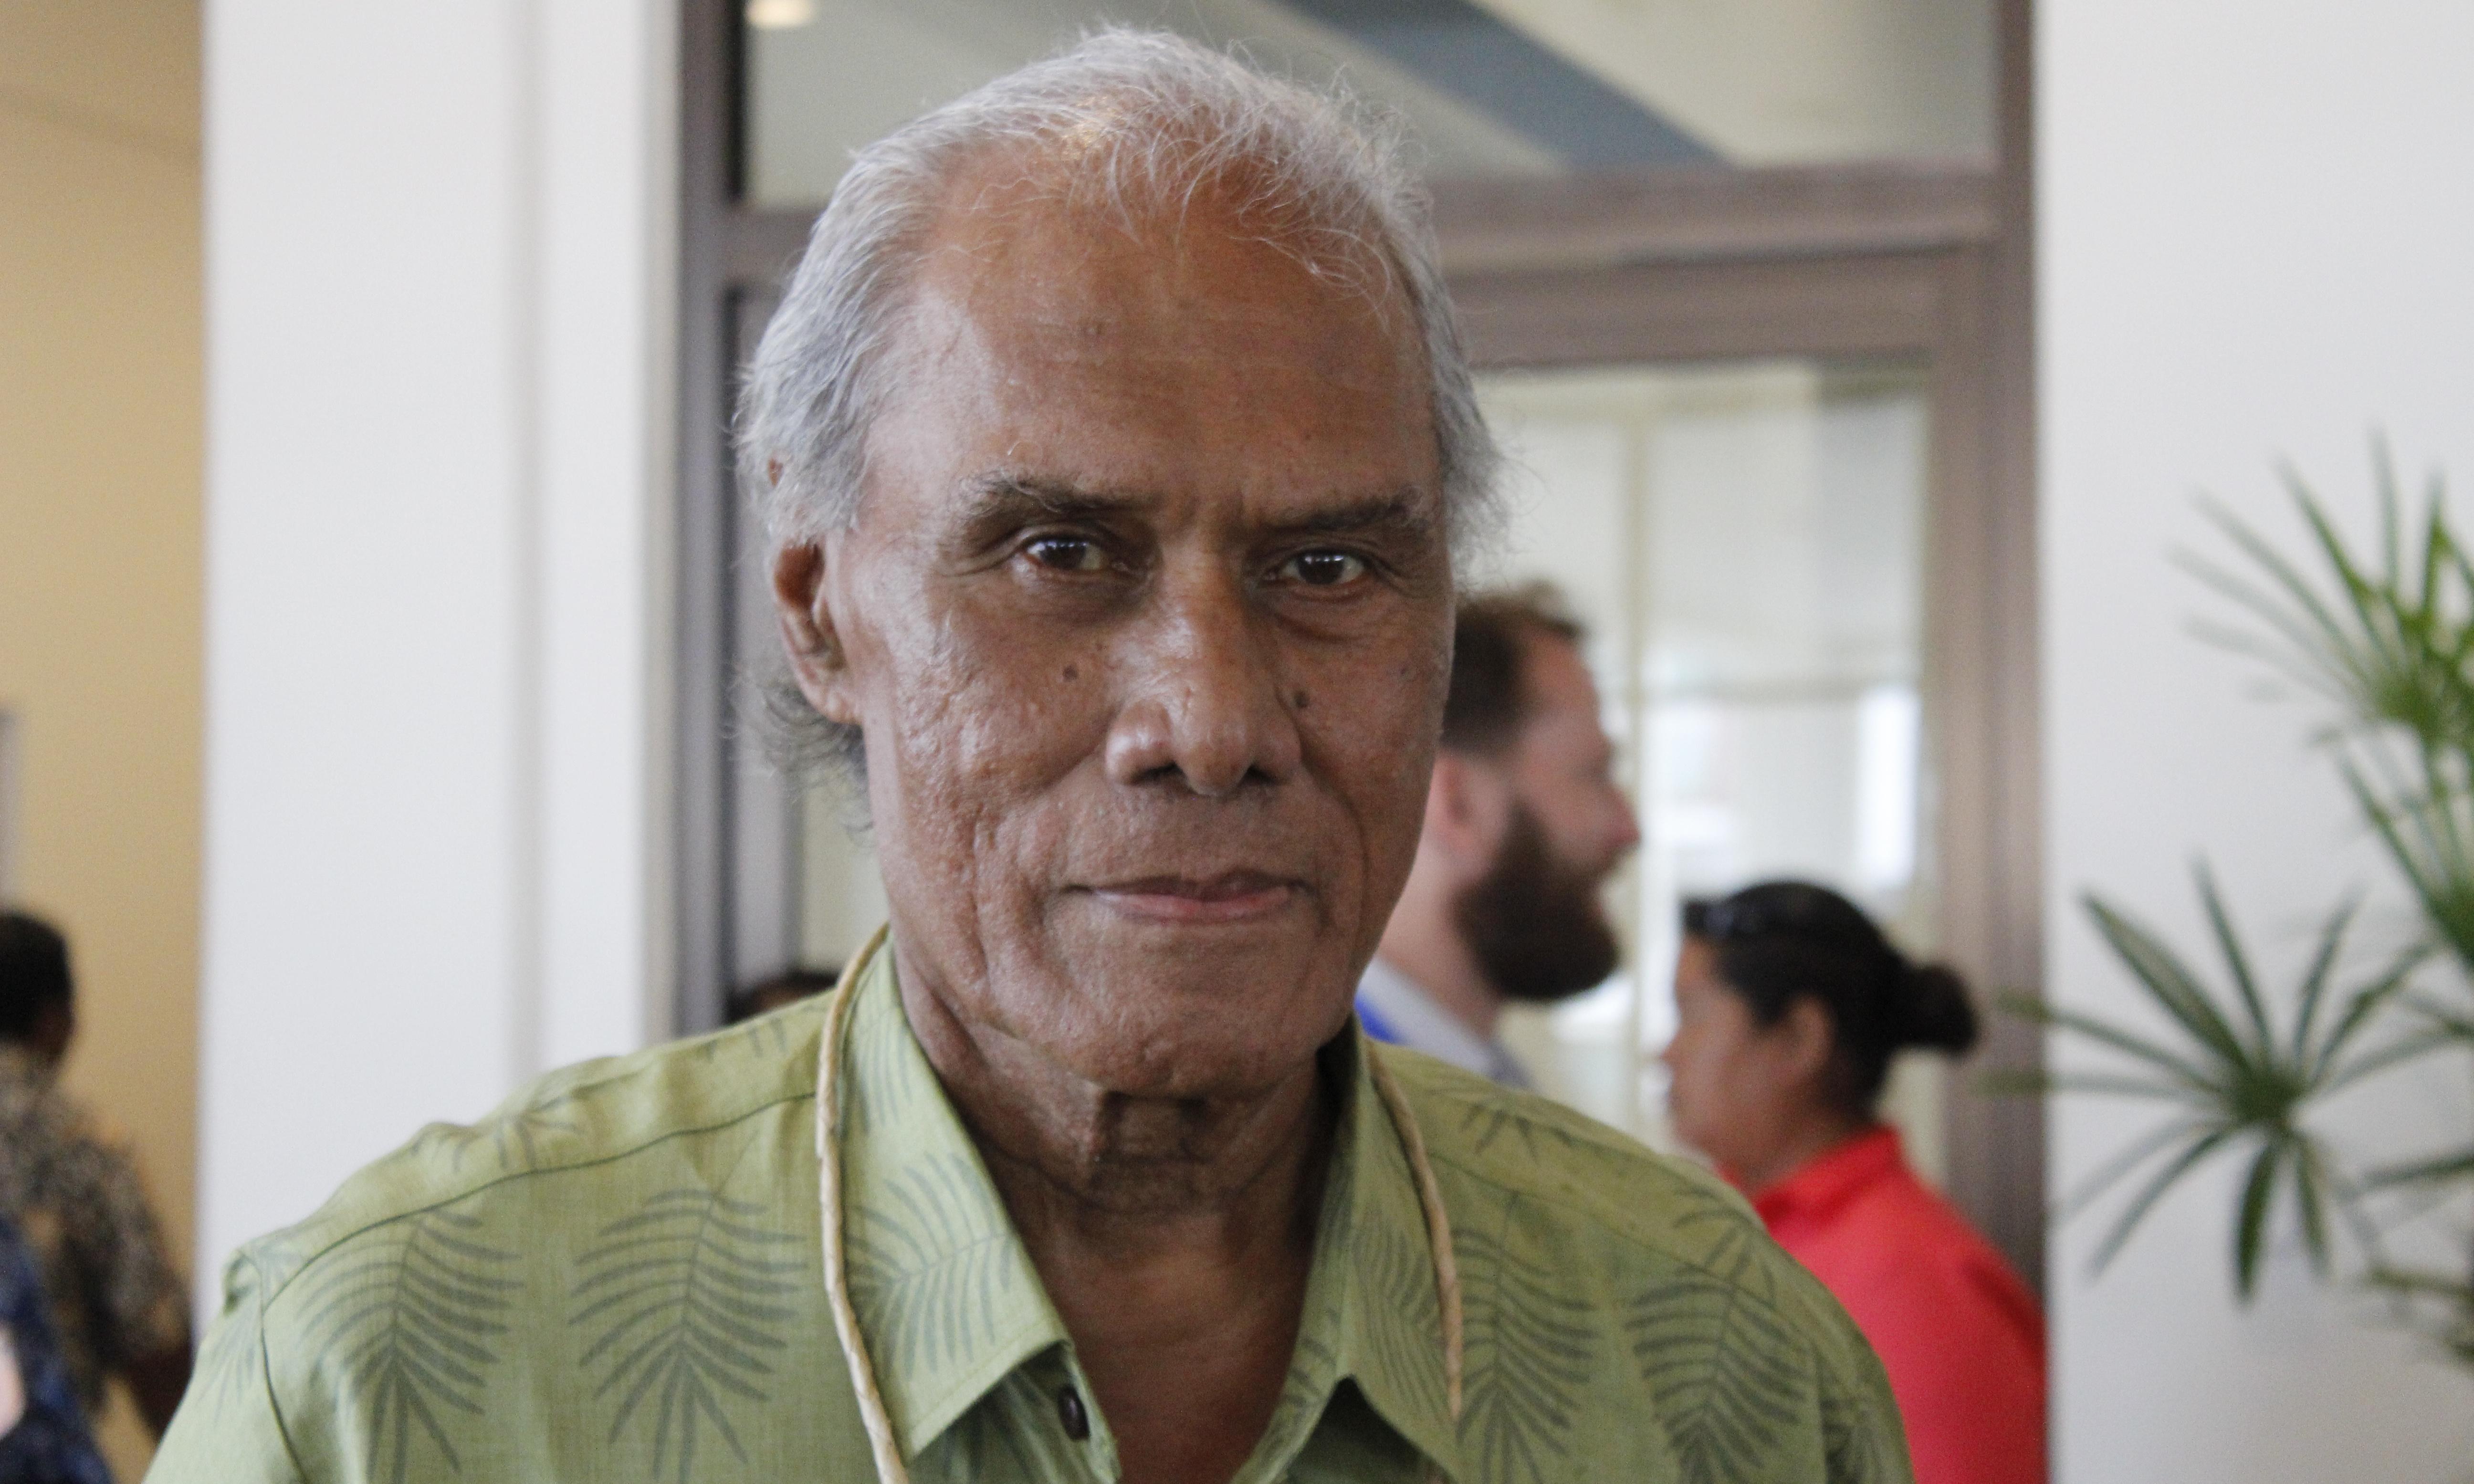 'From firebrand activist to elder statesman': Pacific mourns Tongan PM 'Akilisi Pohiva